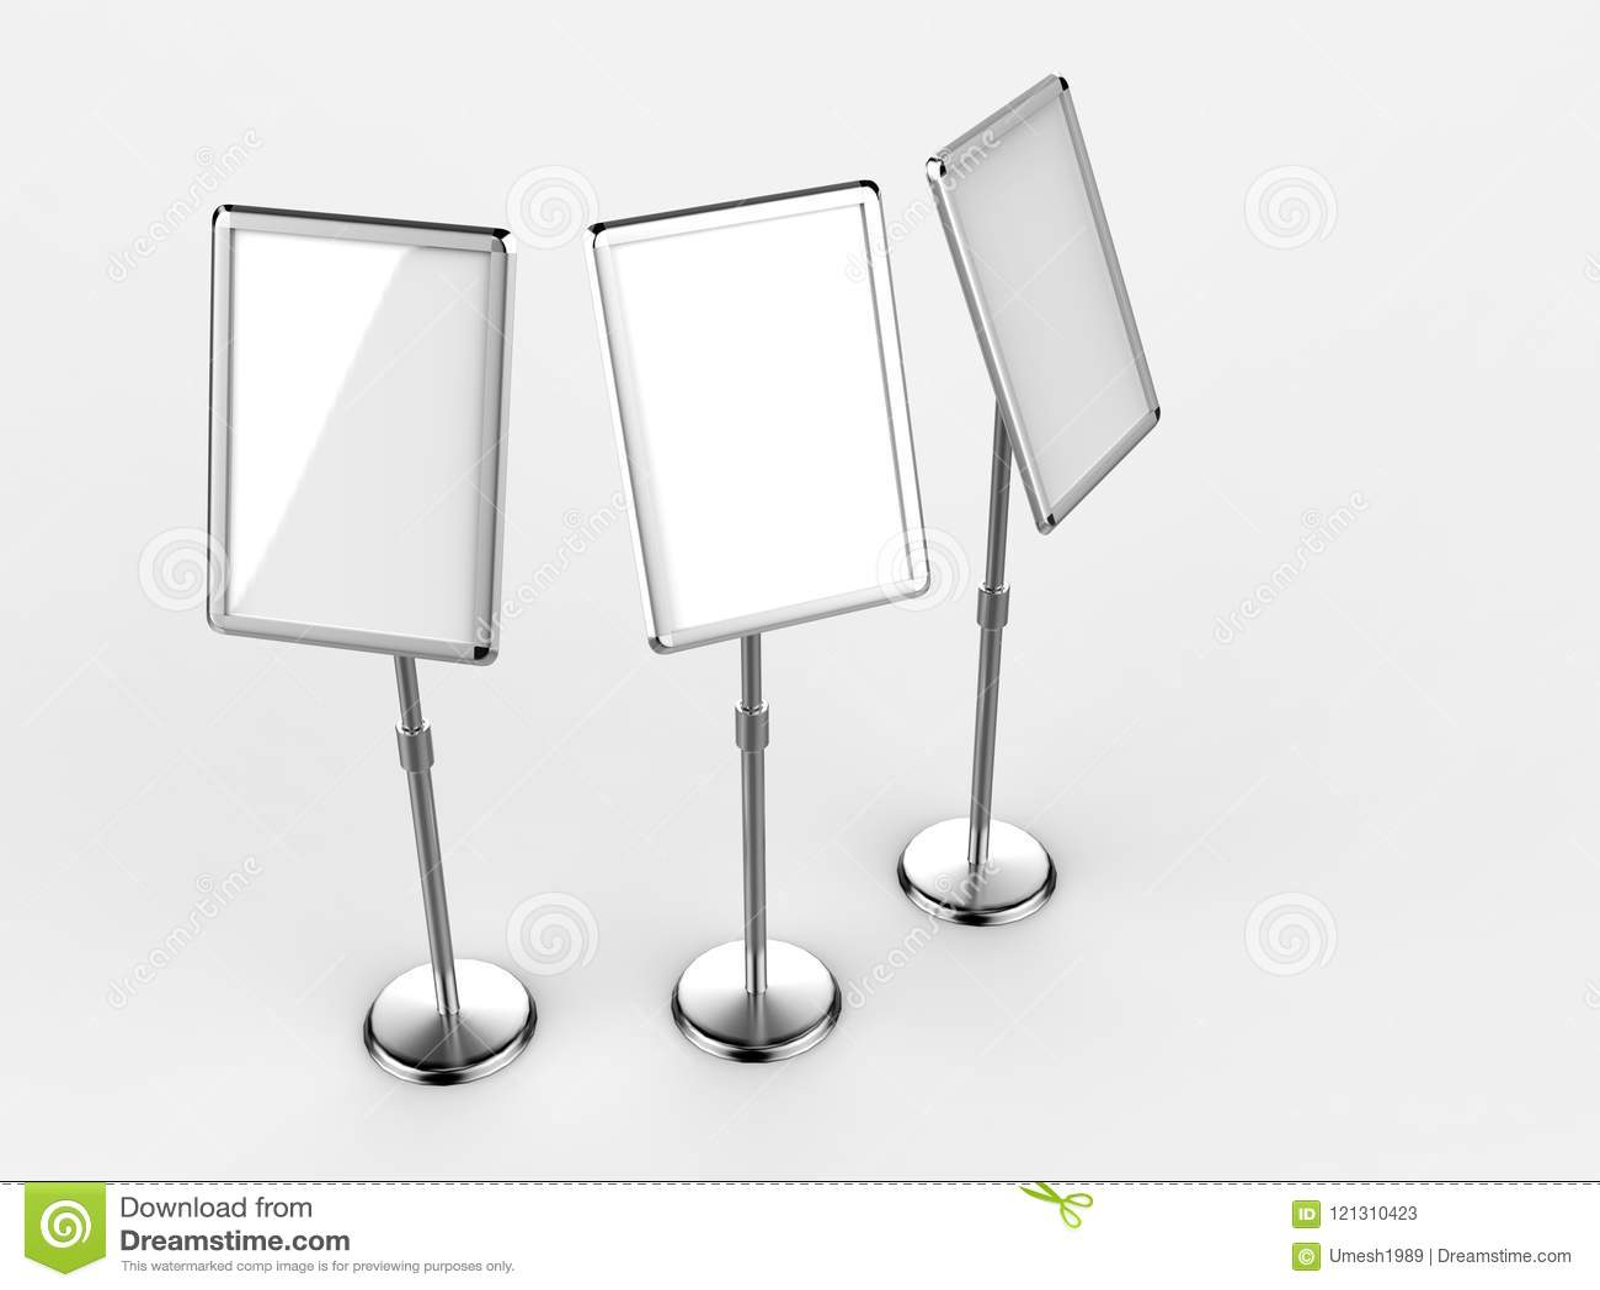 A A Floor Standing Menu Poster Display Holder Snap Frame - Restaurant table sign holders